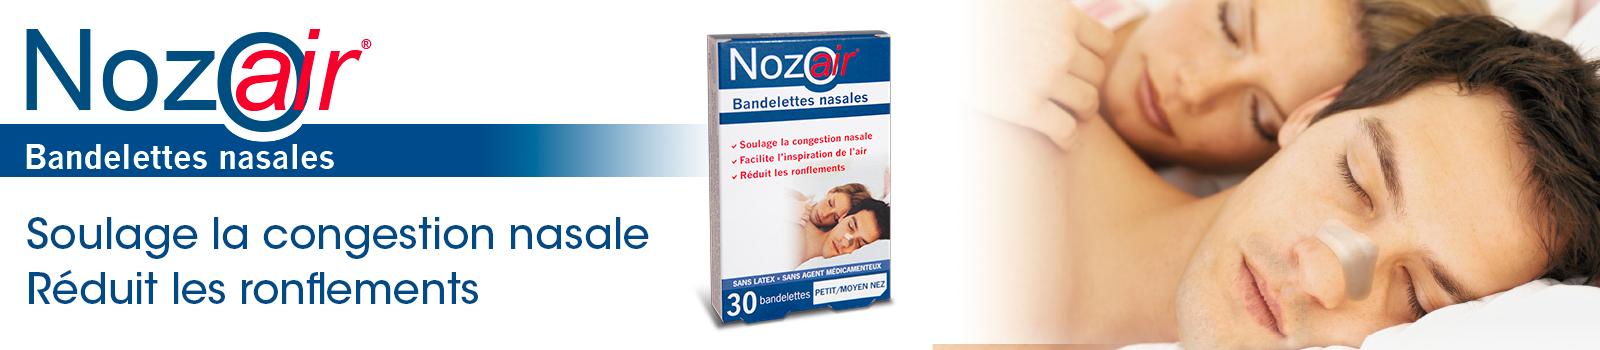 slide_nozoairclassique